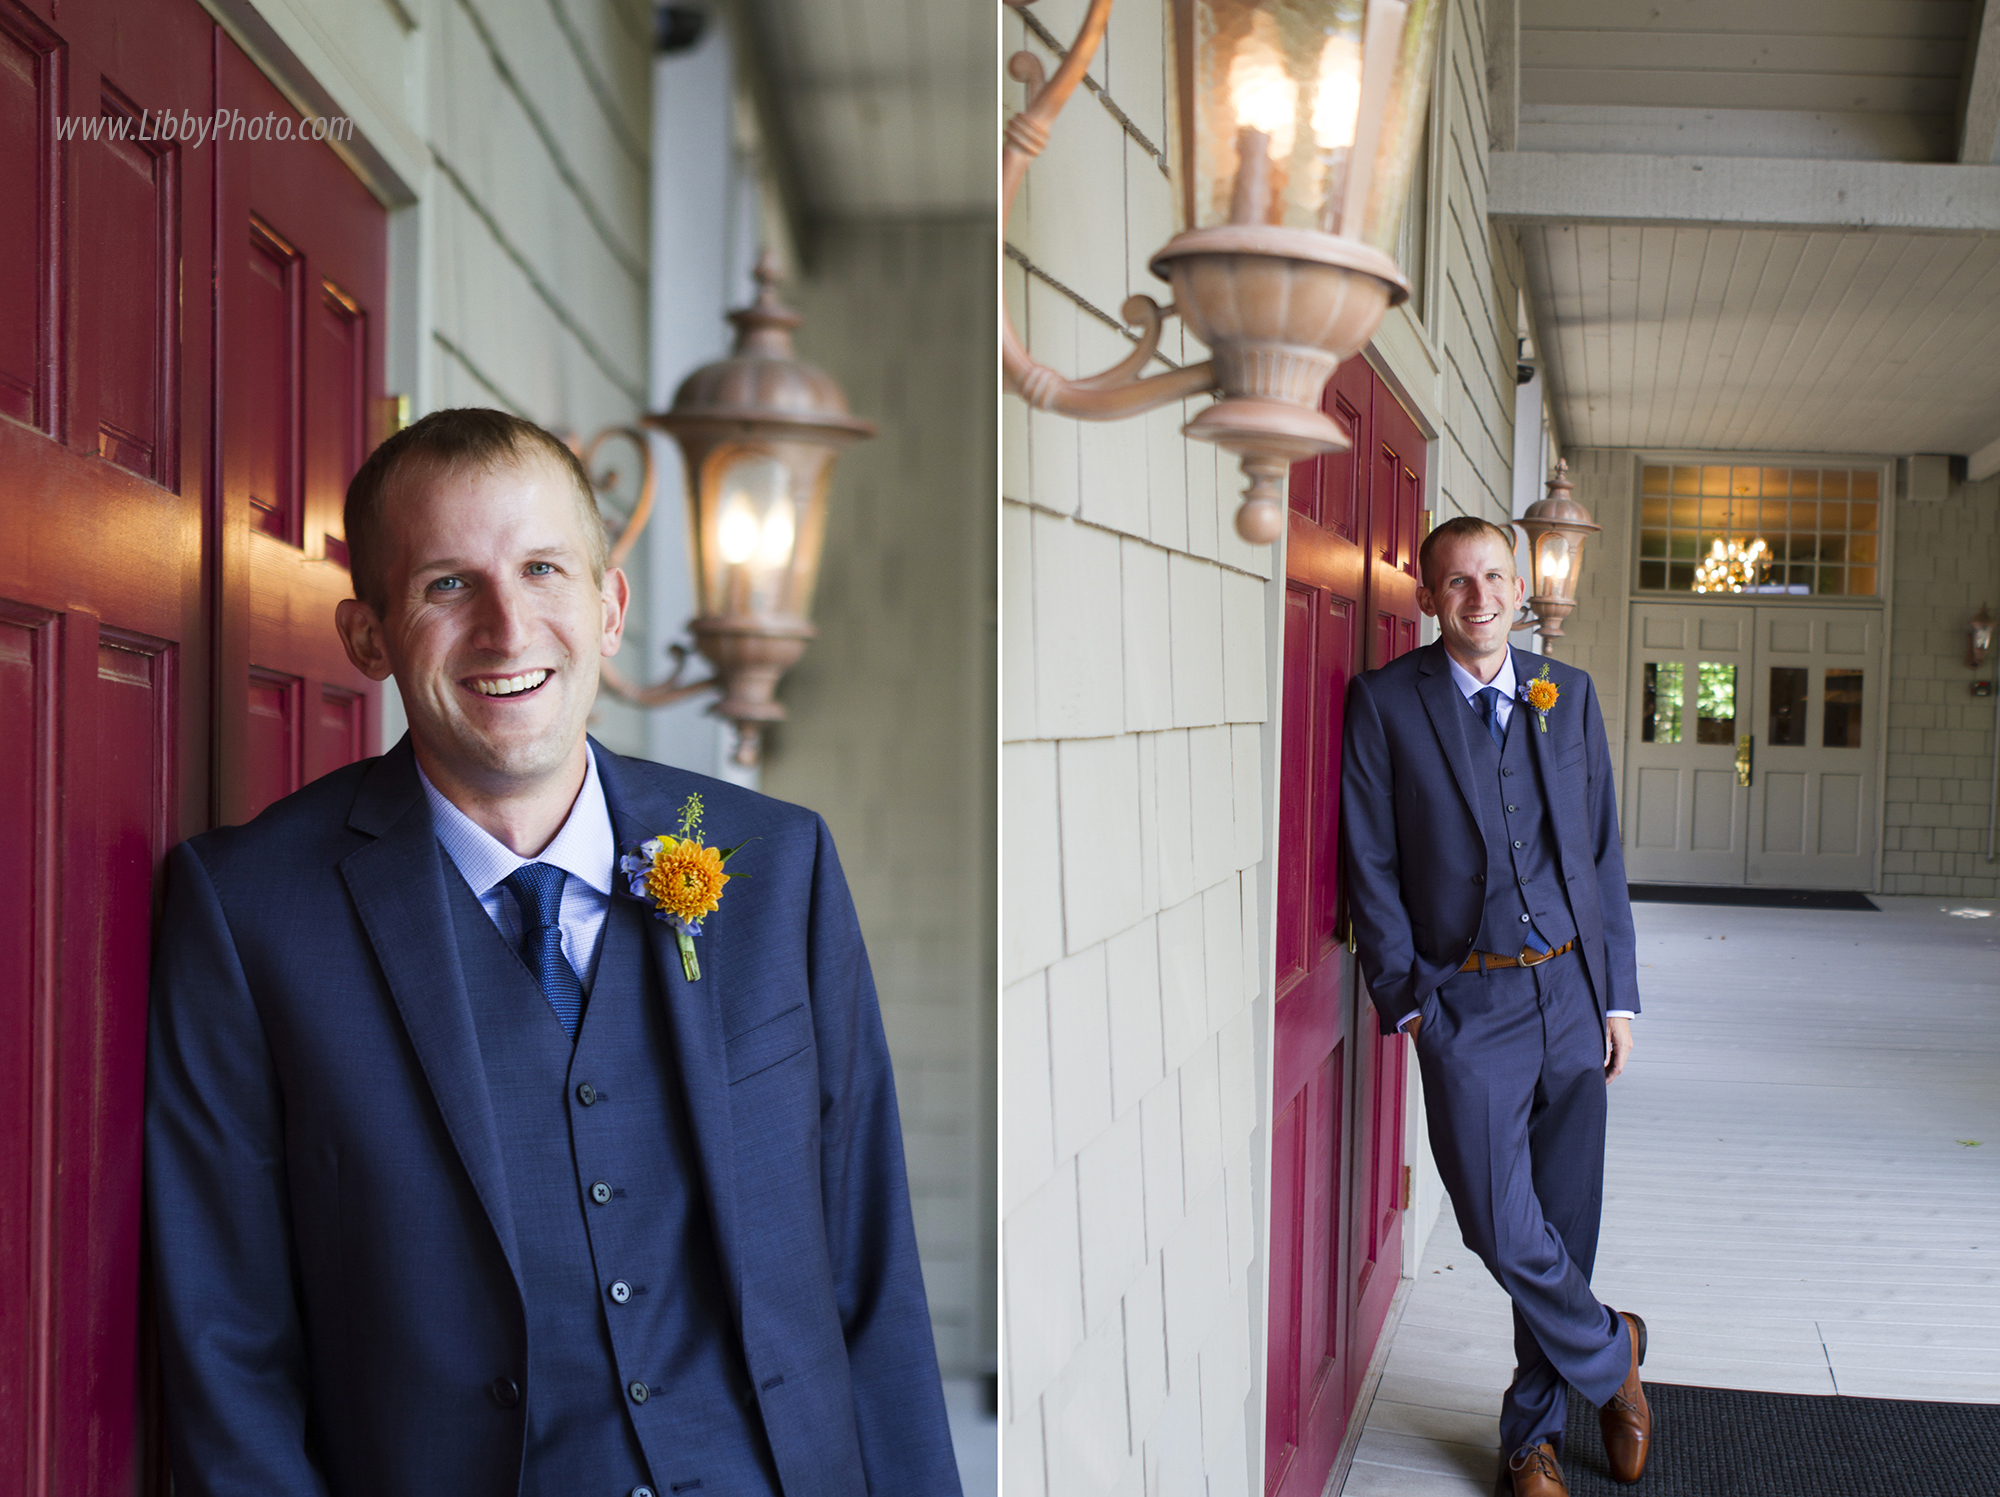 Atlanta wedding photography, Libbyphoto11 (31).jpg